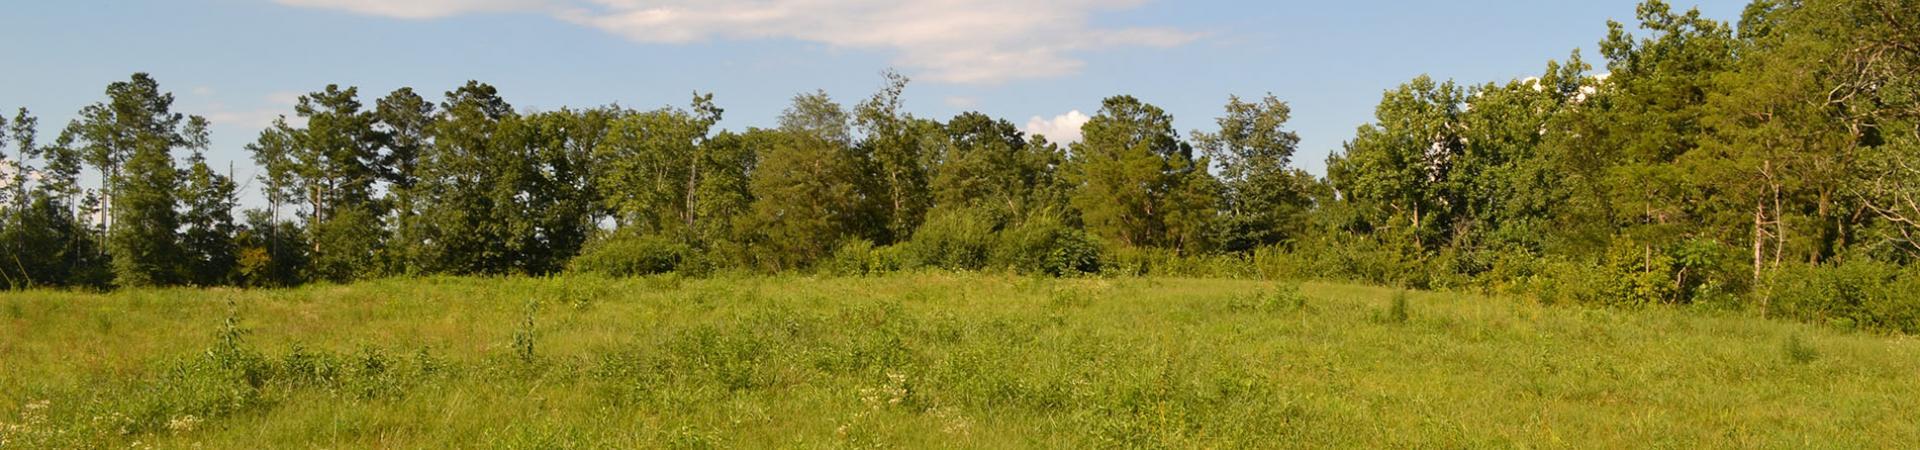 McEntire Road Open Field